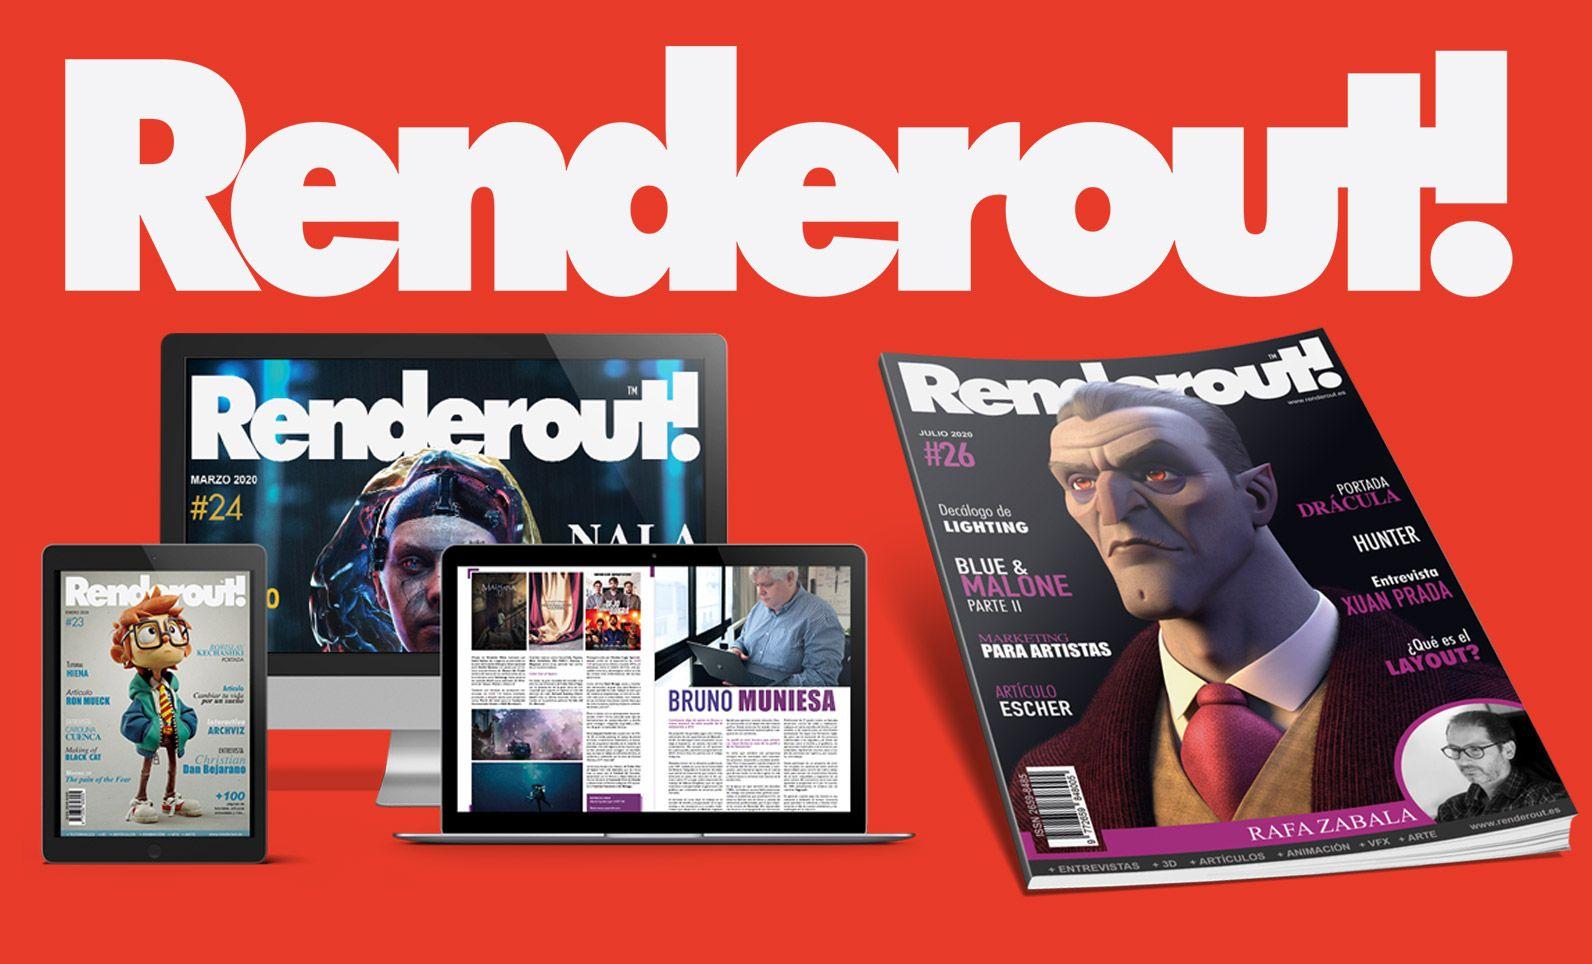 Revista renderout